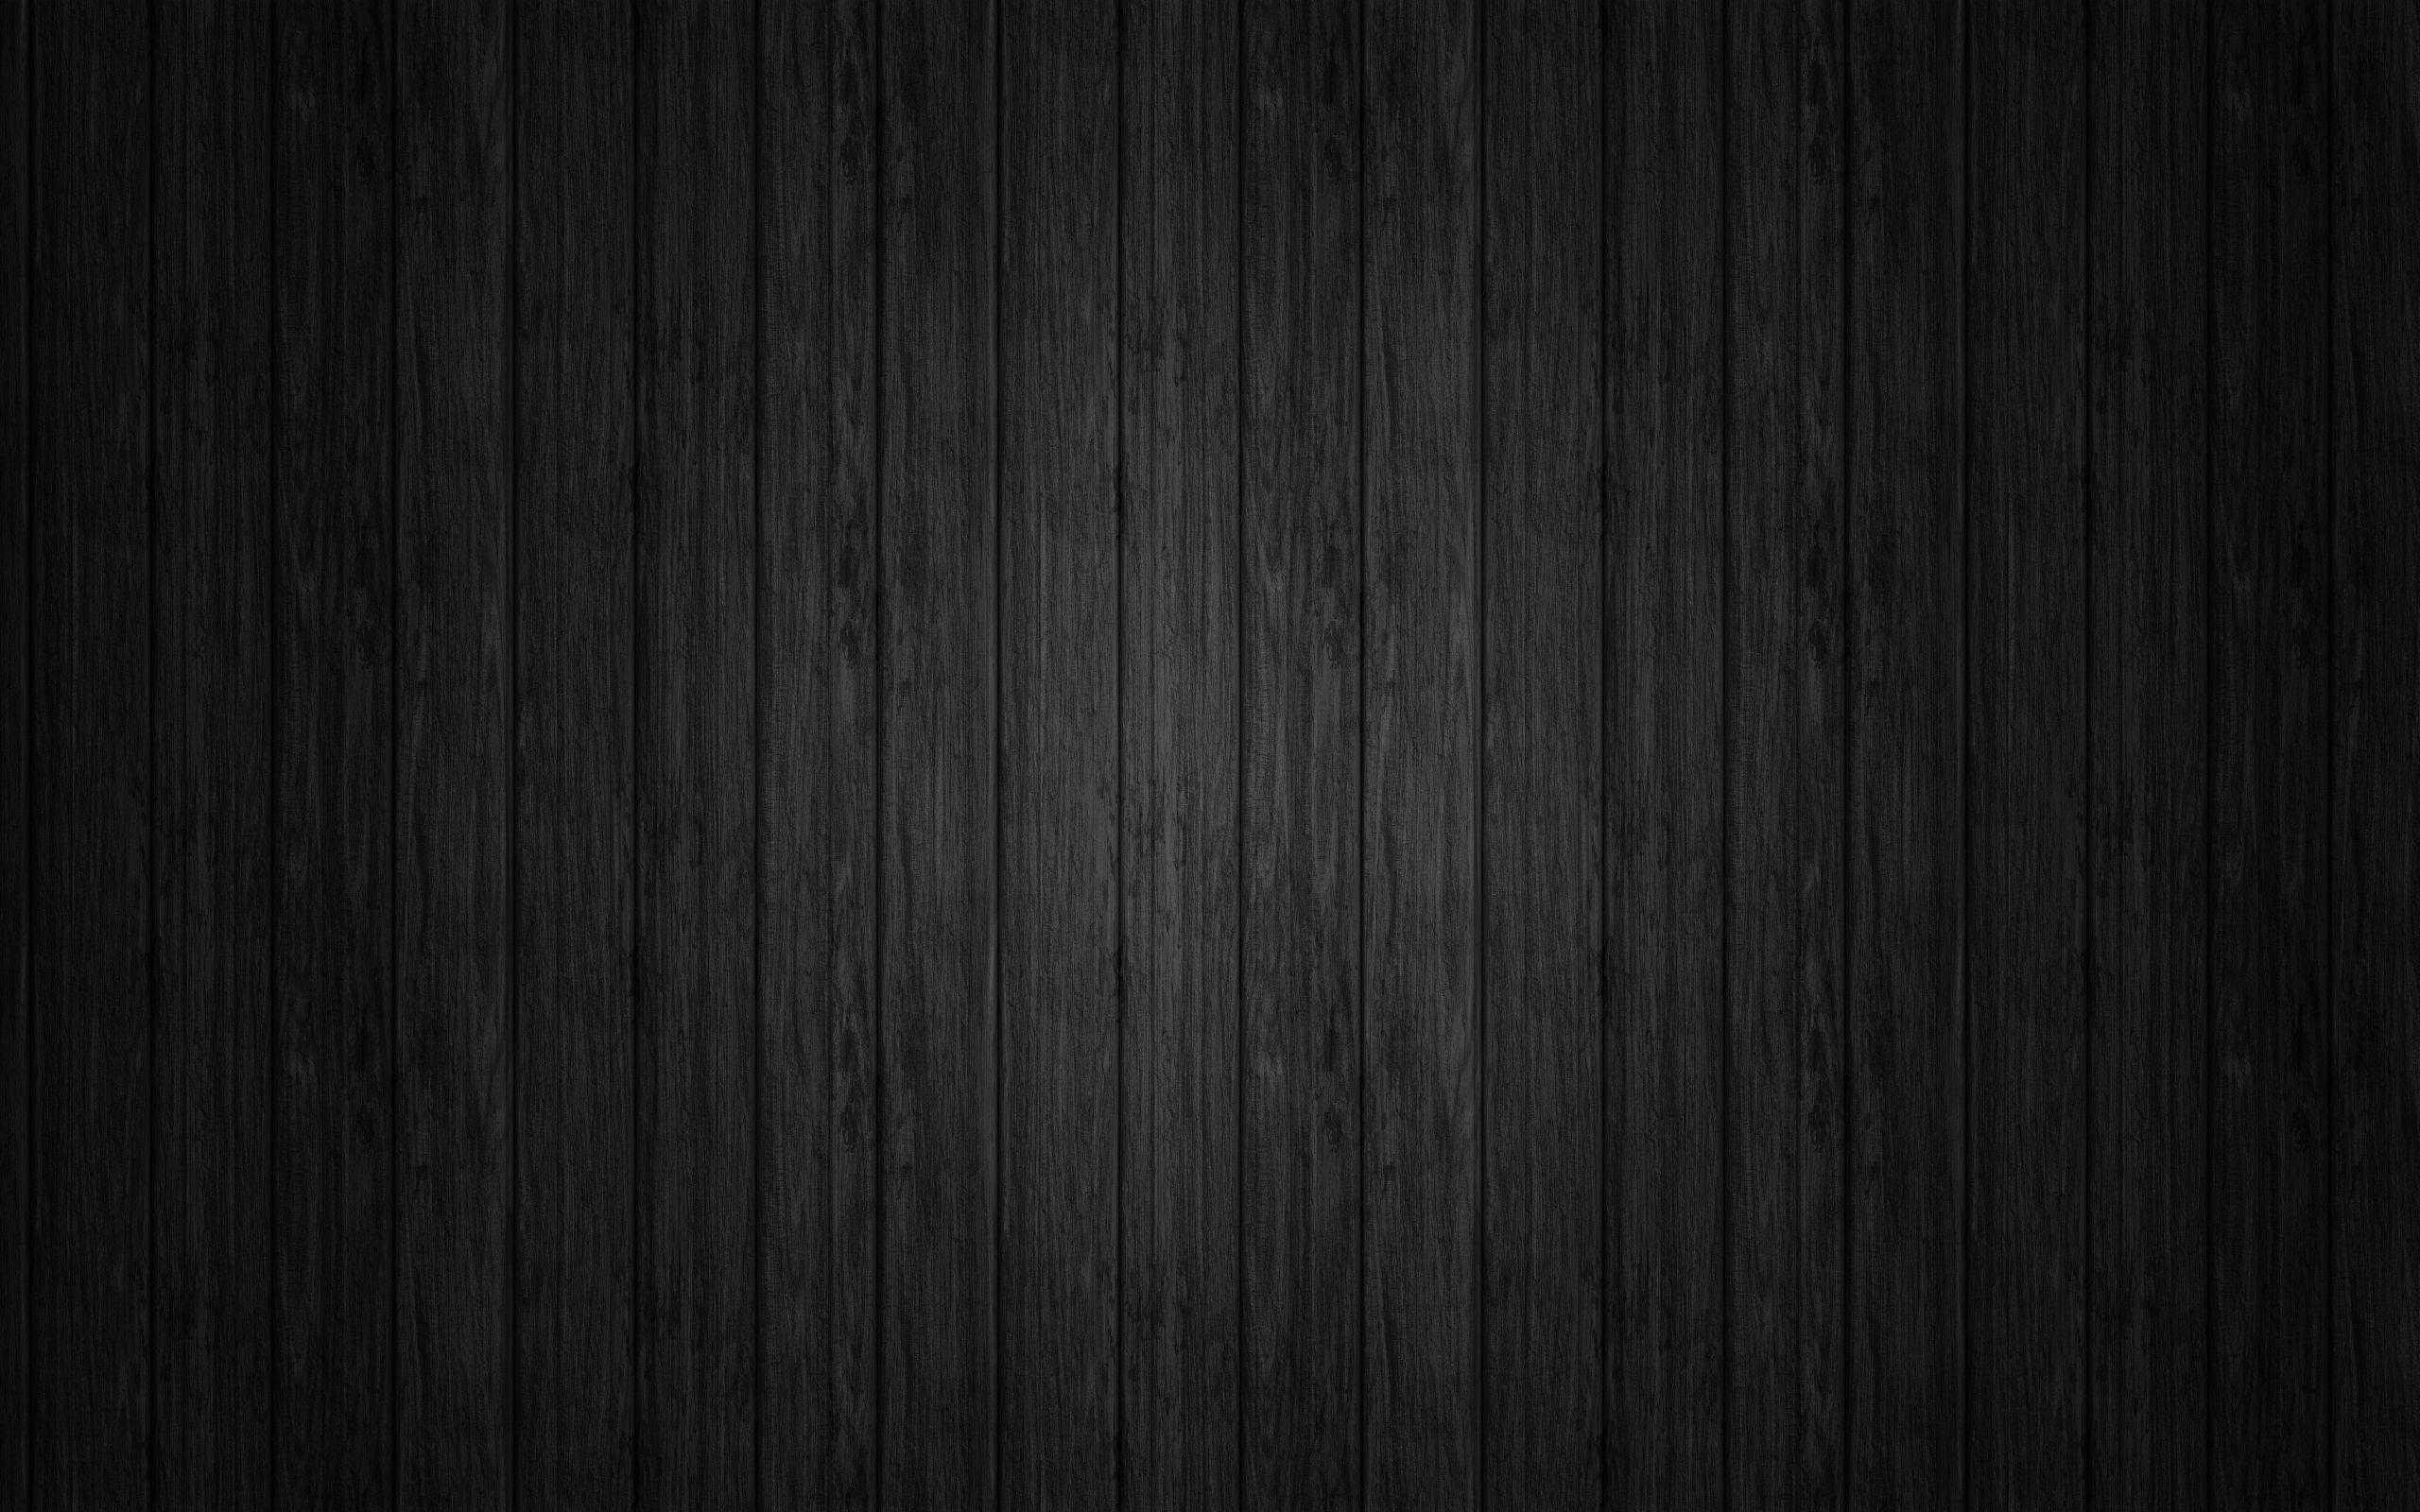 Plain Black Wallpaper Large Hd Wallpaper Database Black Wood Background Black Wood Texture Black Textured Wallpaper